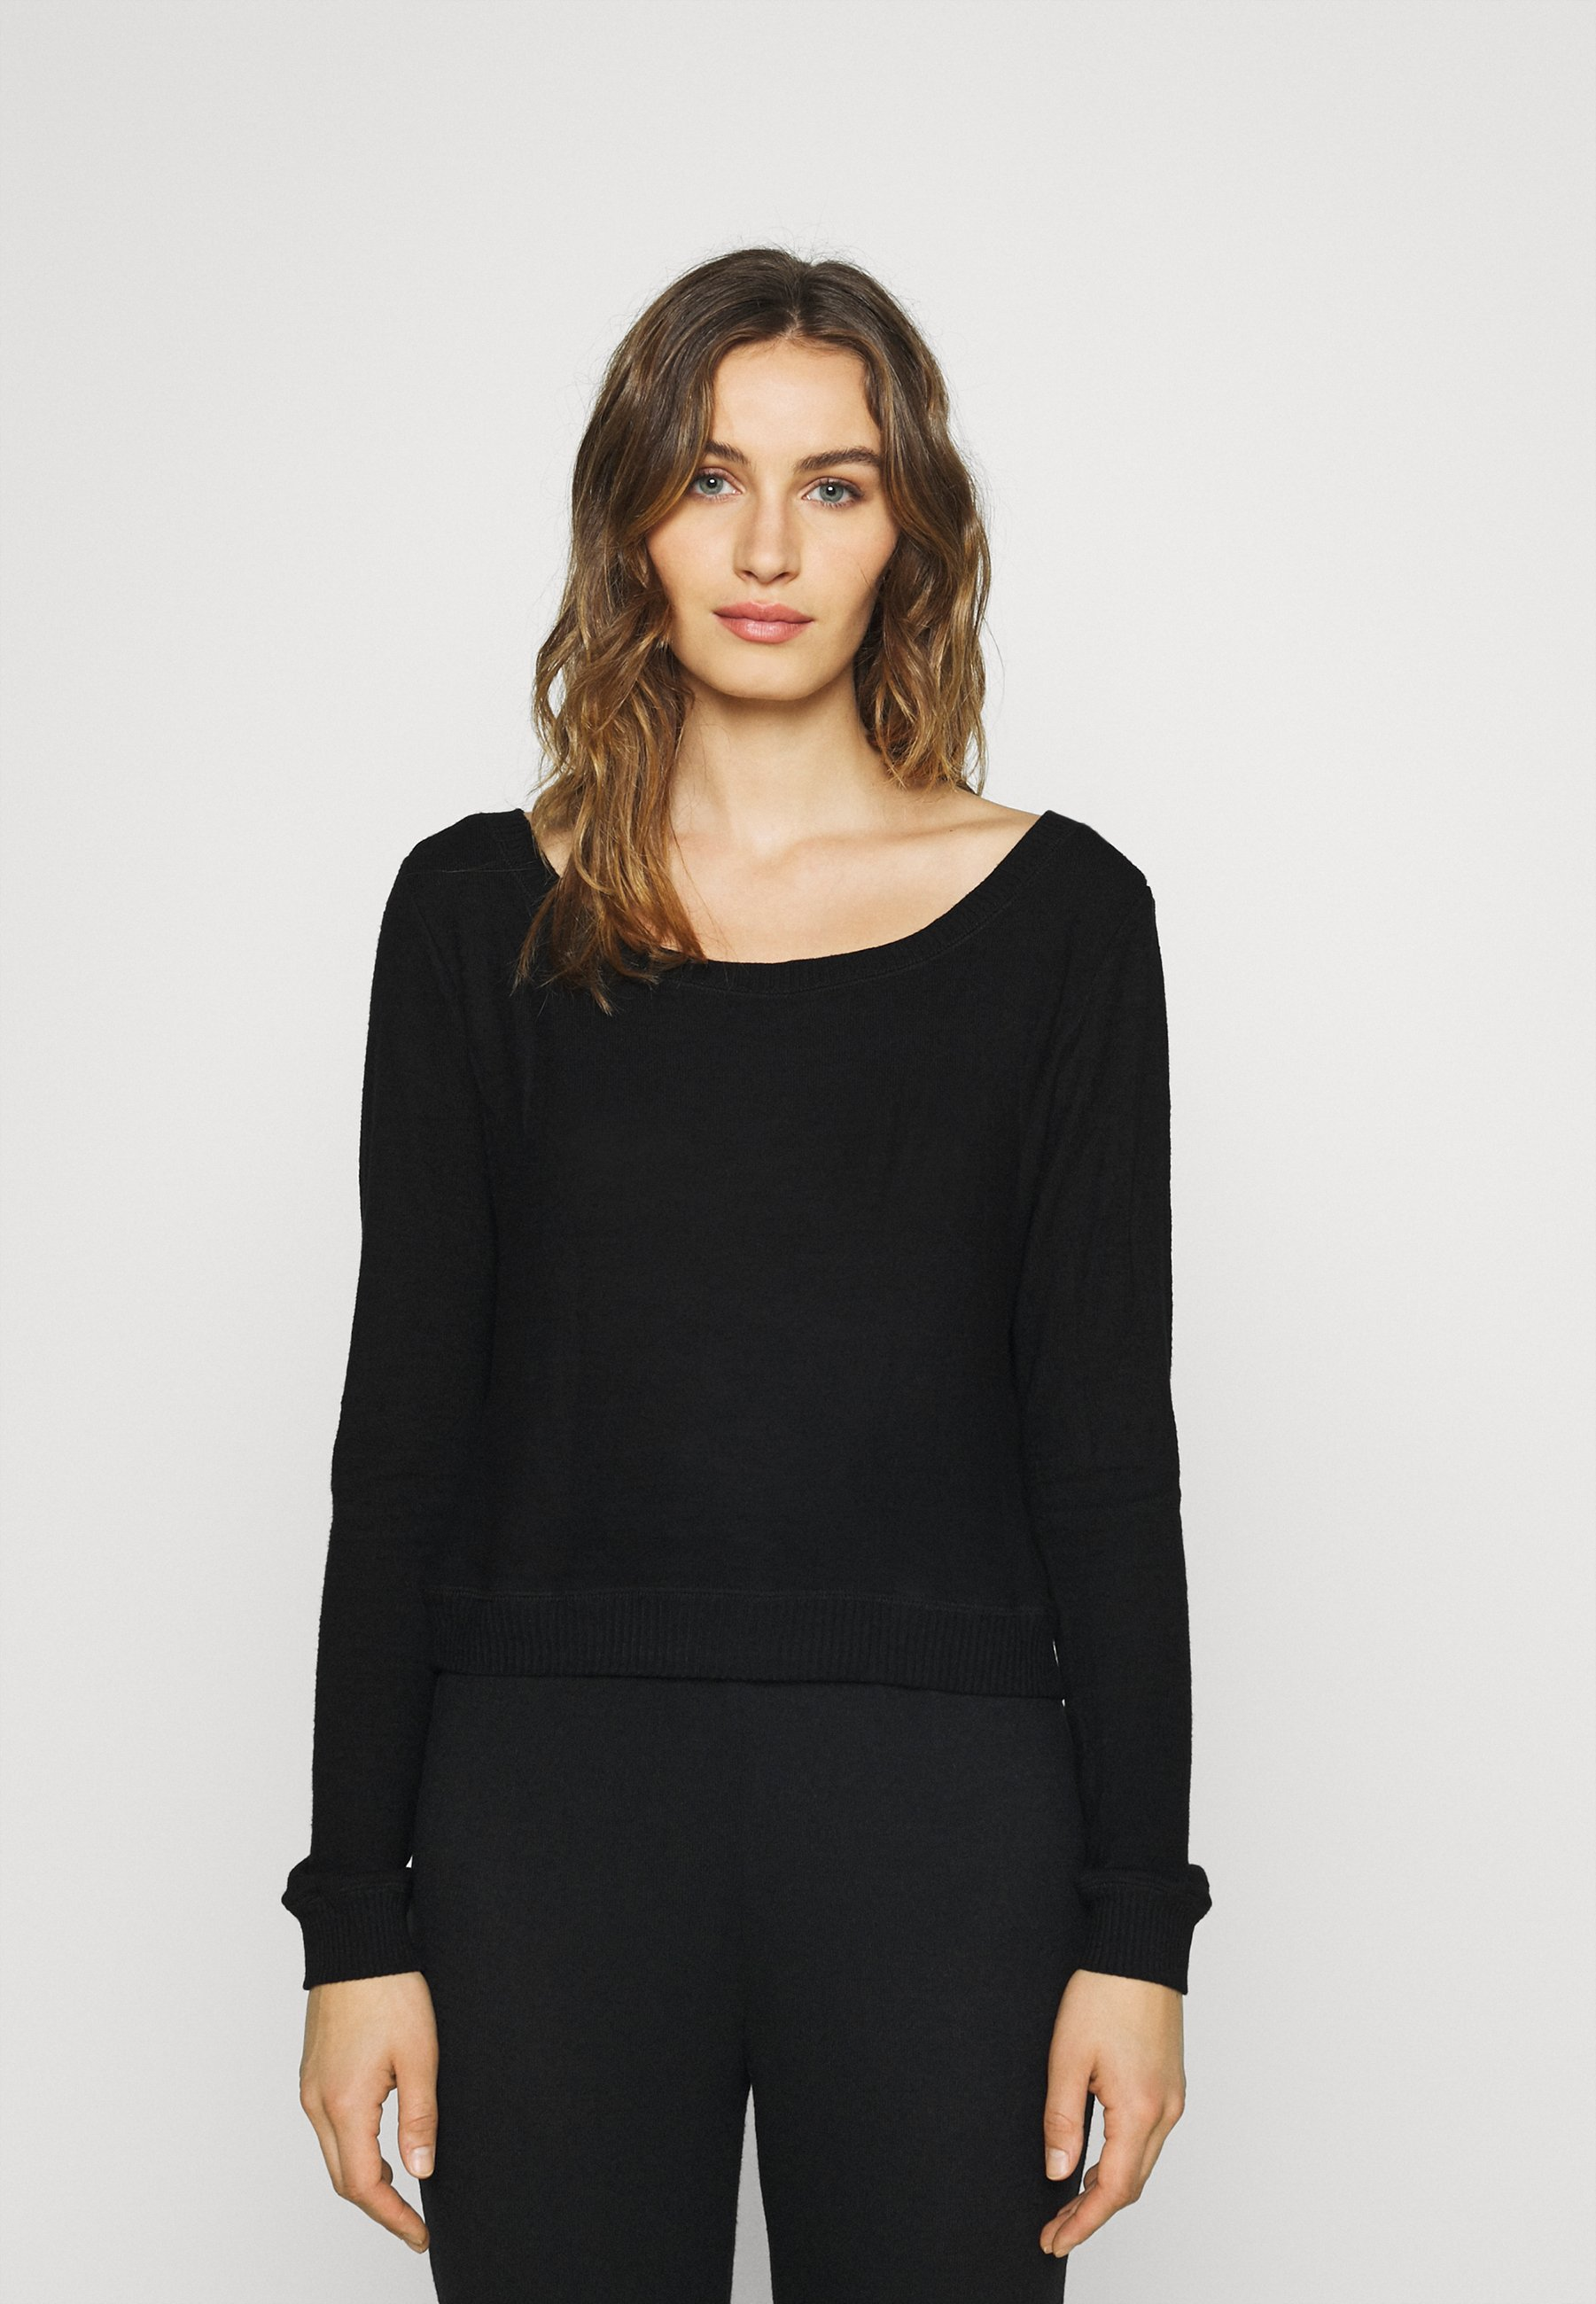 Damen CALM - Nachtwäsche Shirt